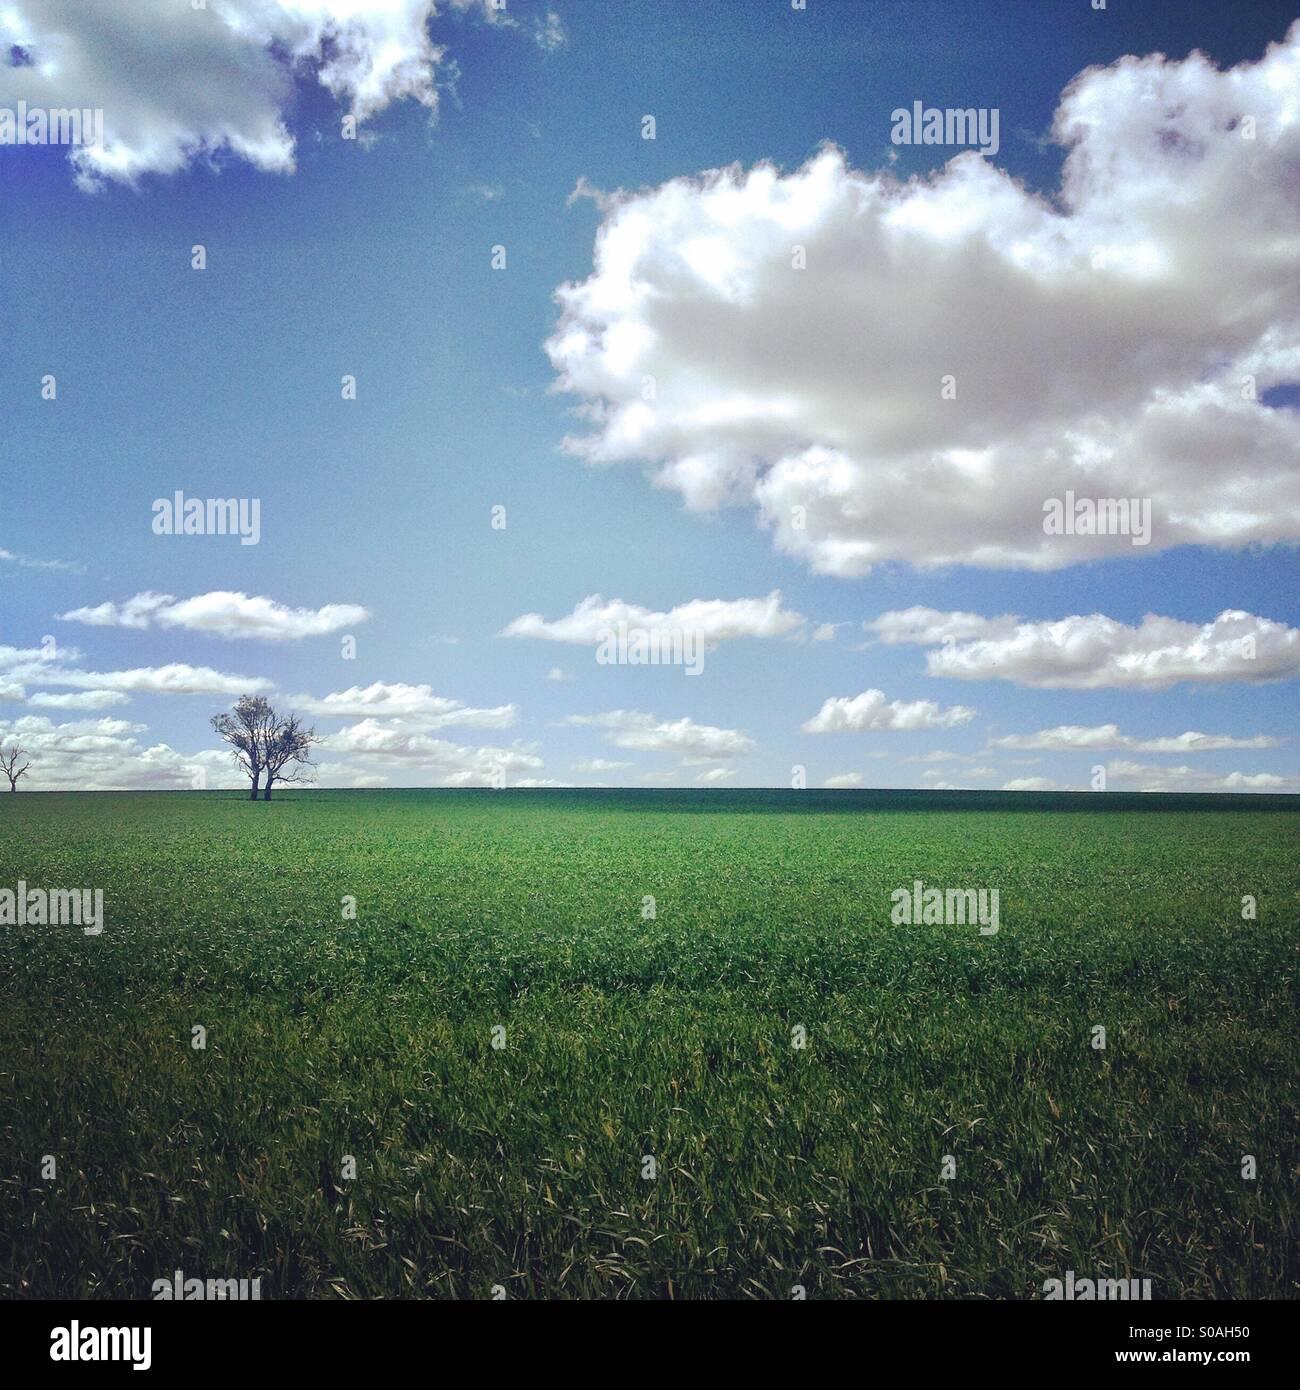 Rural Australia in summer - Stock Image